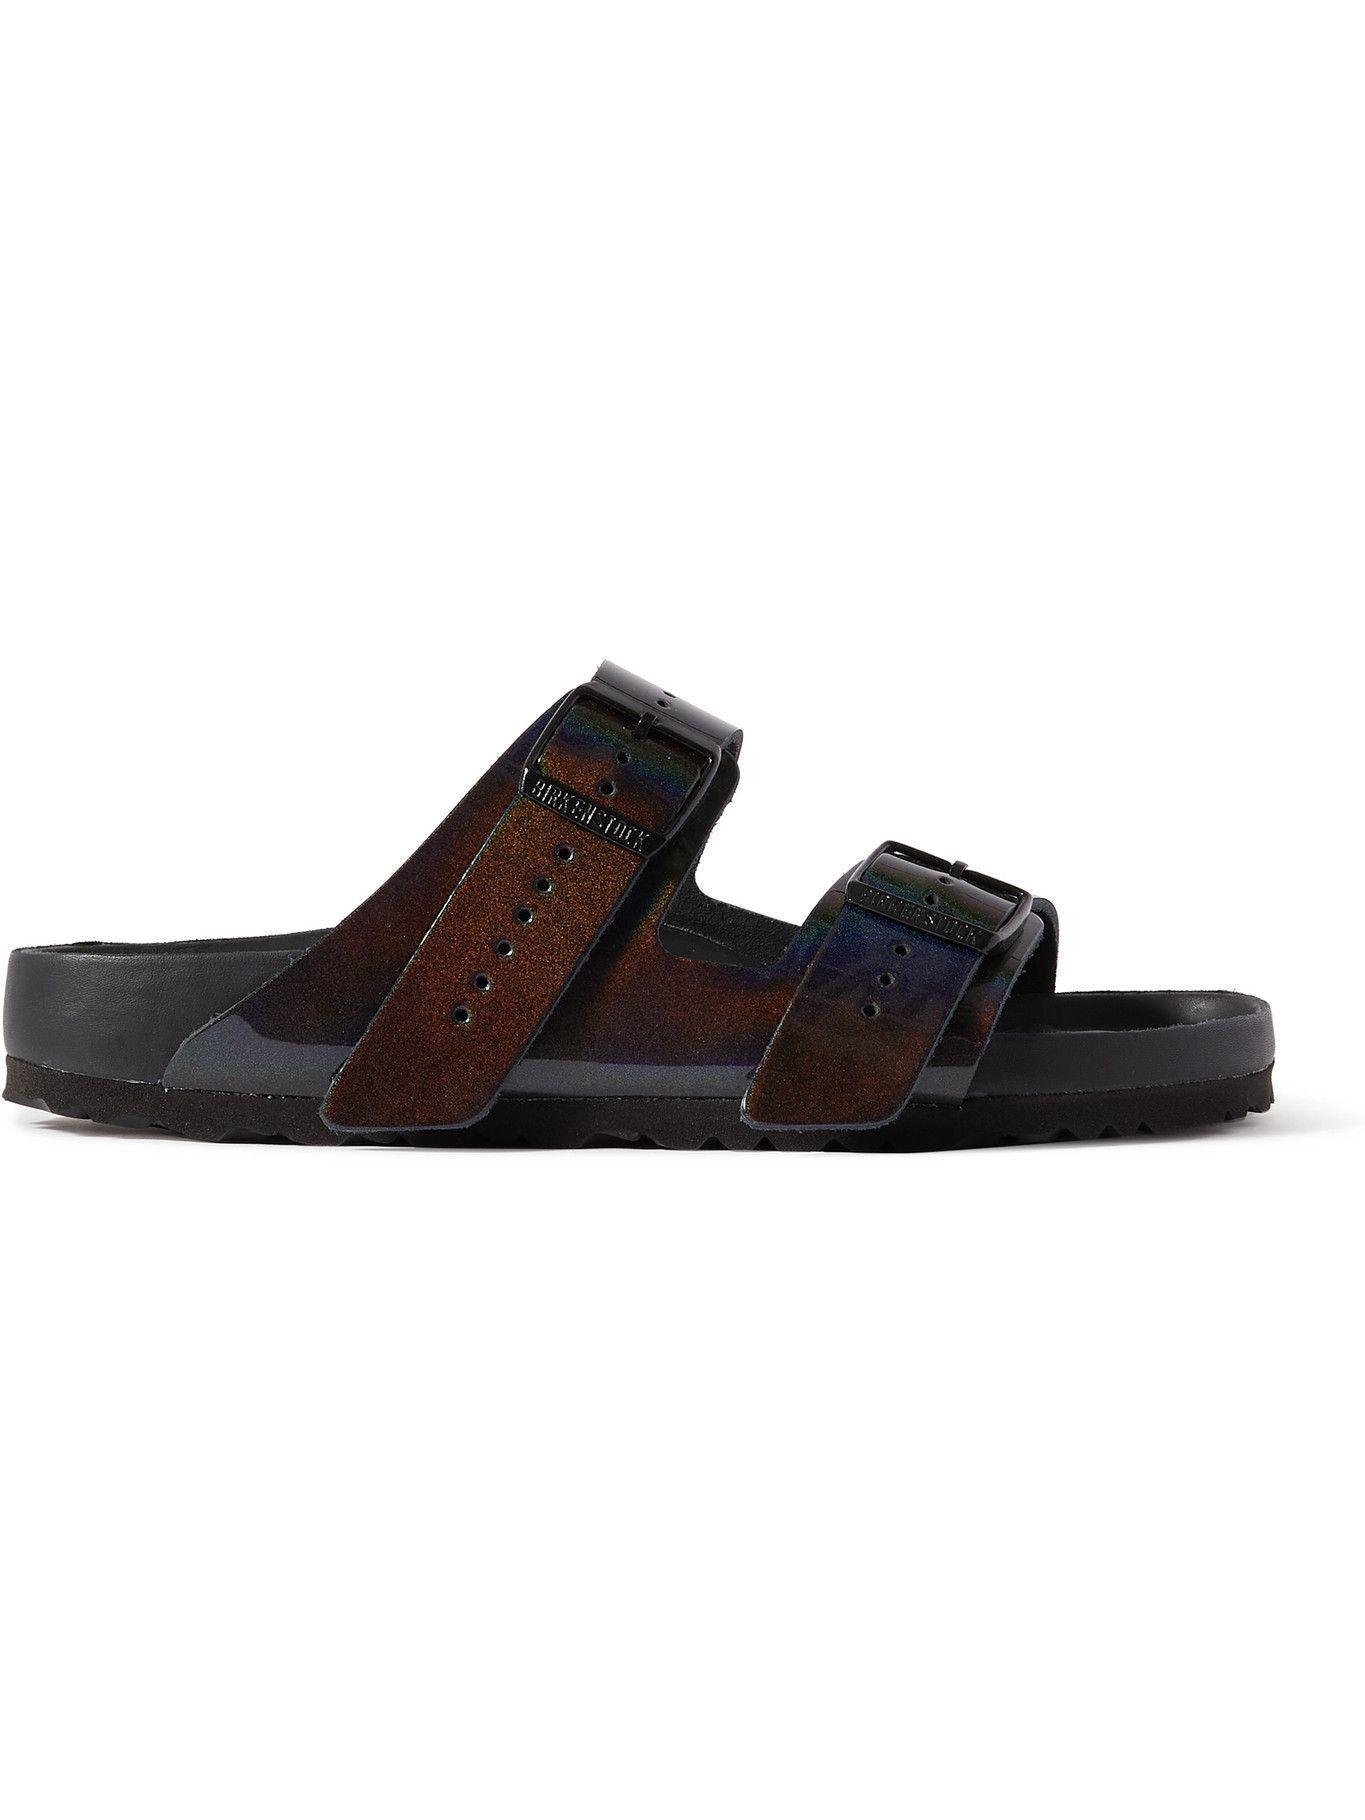 Photo: RICK OWENS - Birkenstock Arizona Iridescent Leather Sandals - Blue